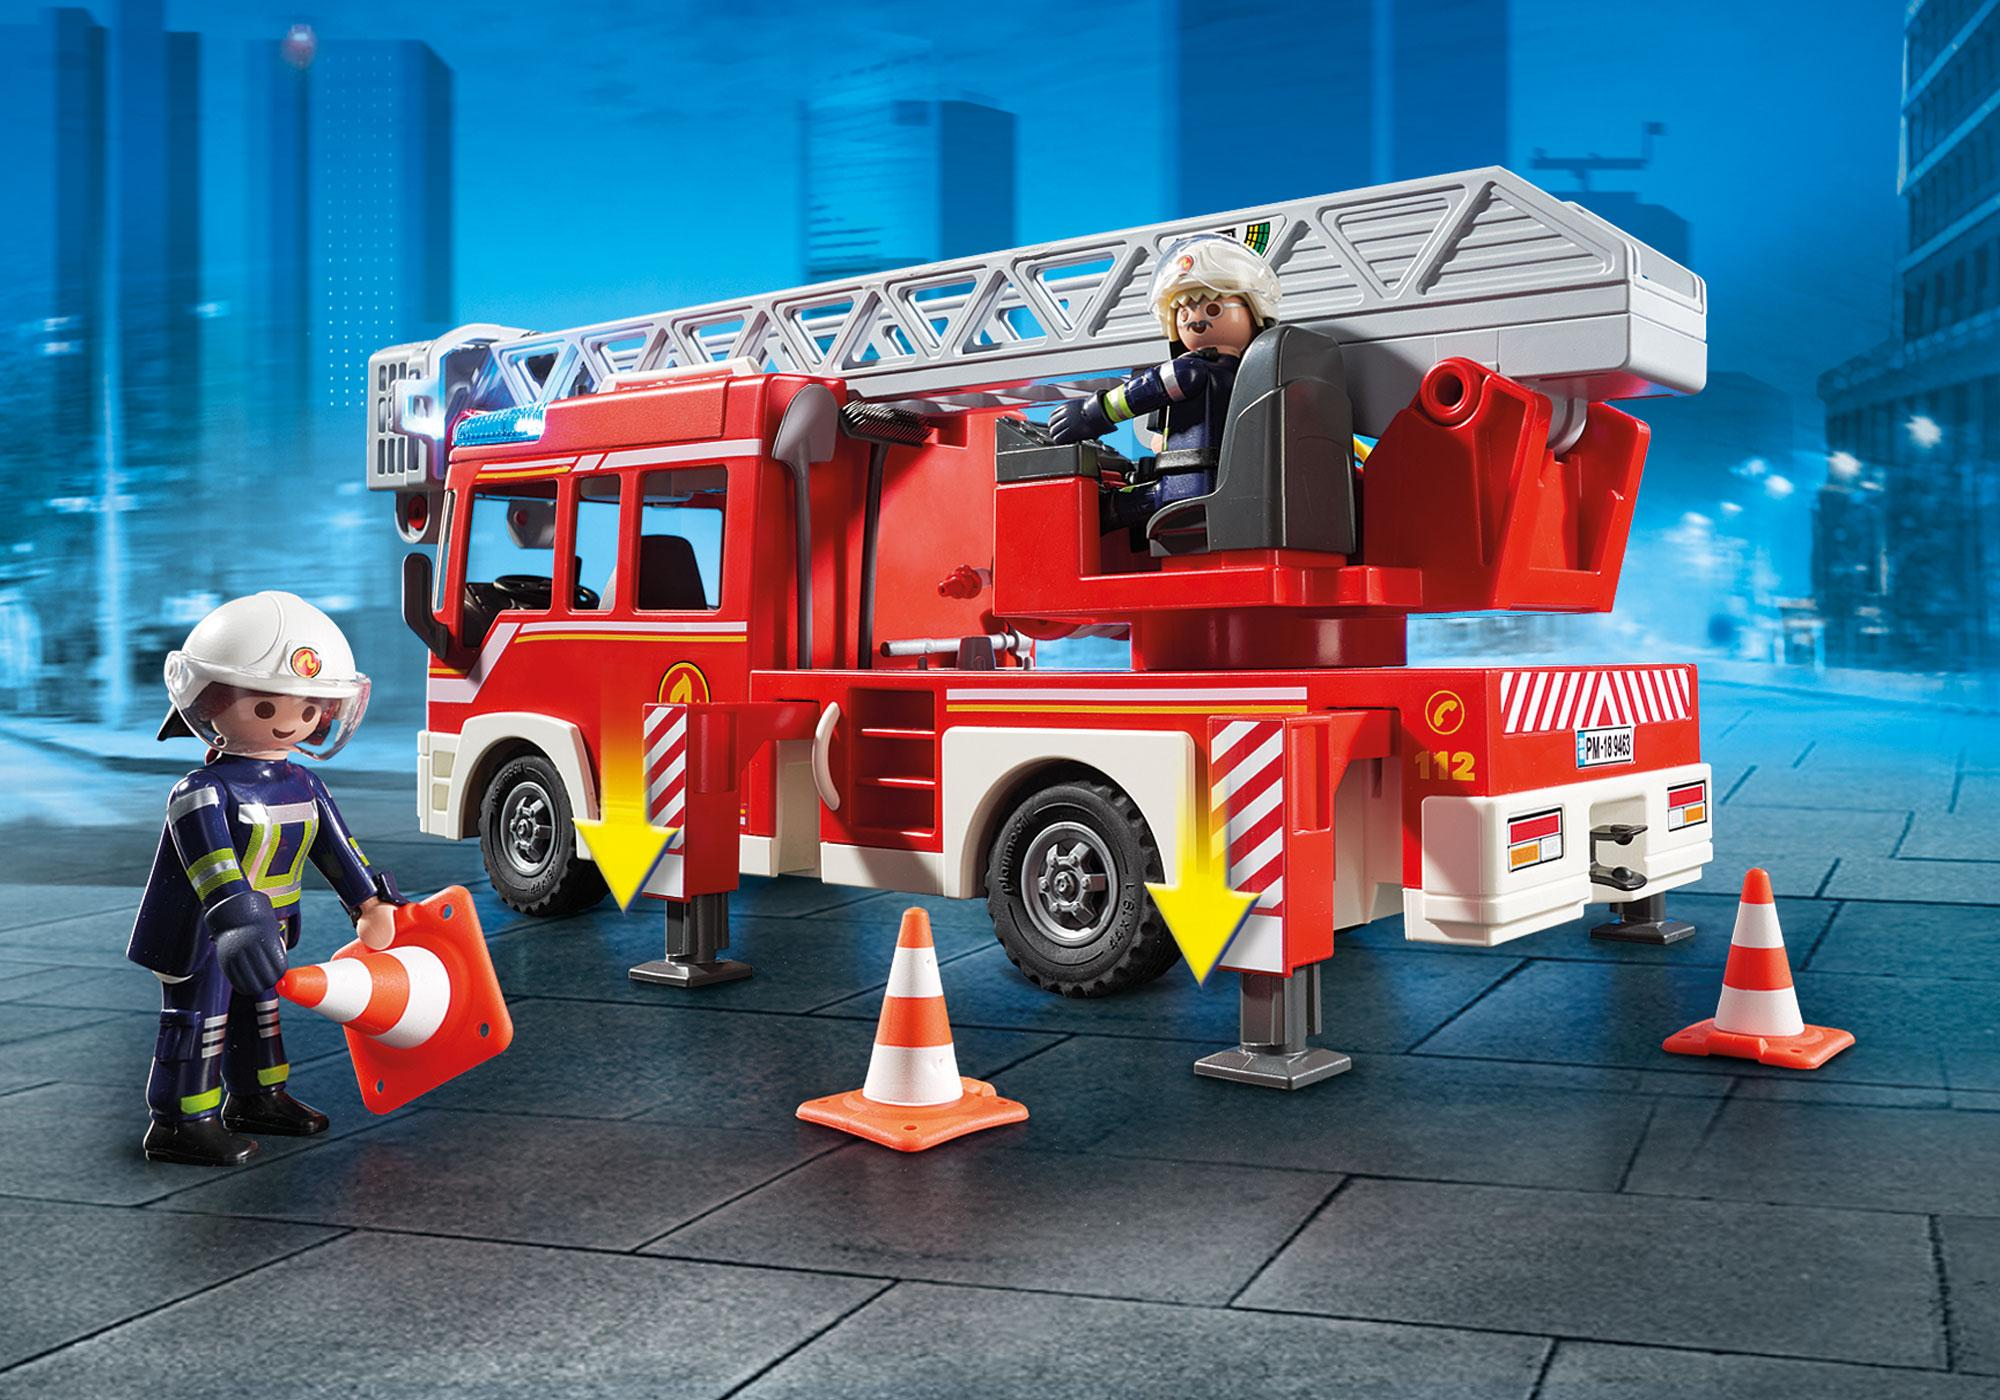 http://media.playmobil.com/i/playmobil/9463_product_extra2/Samochód strażacki z drabiną